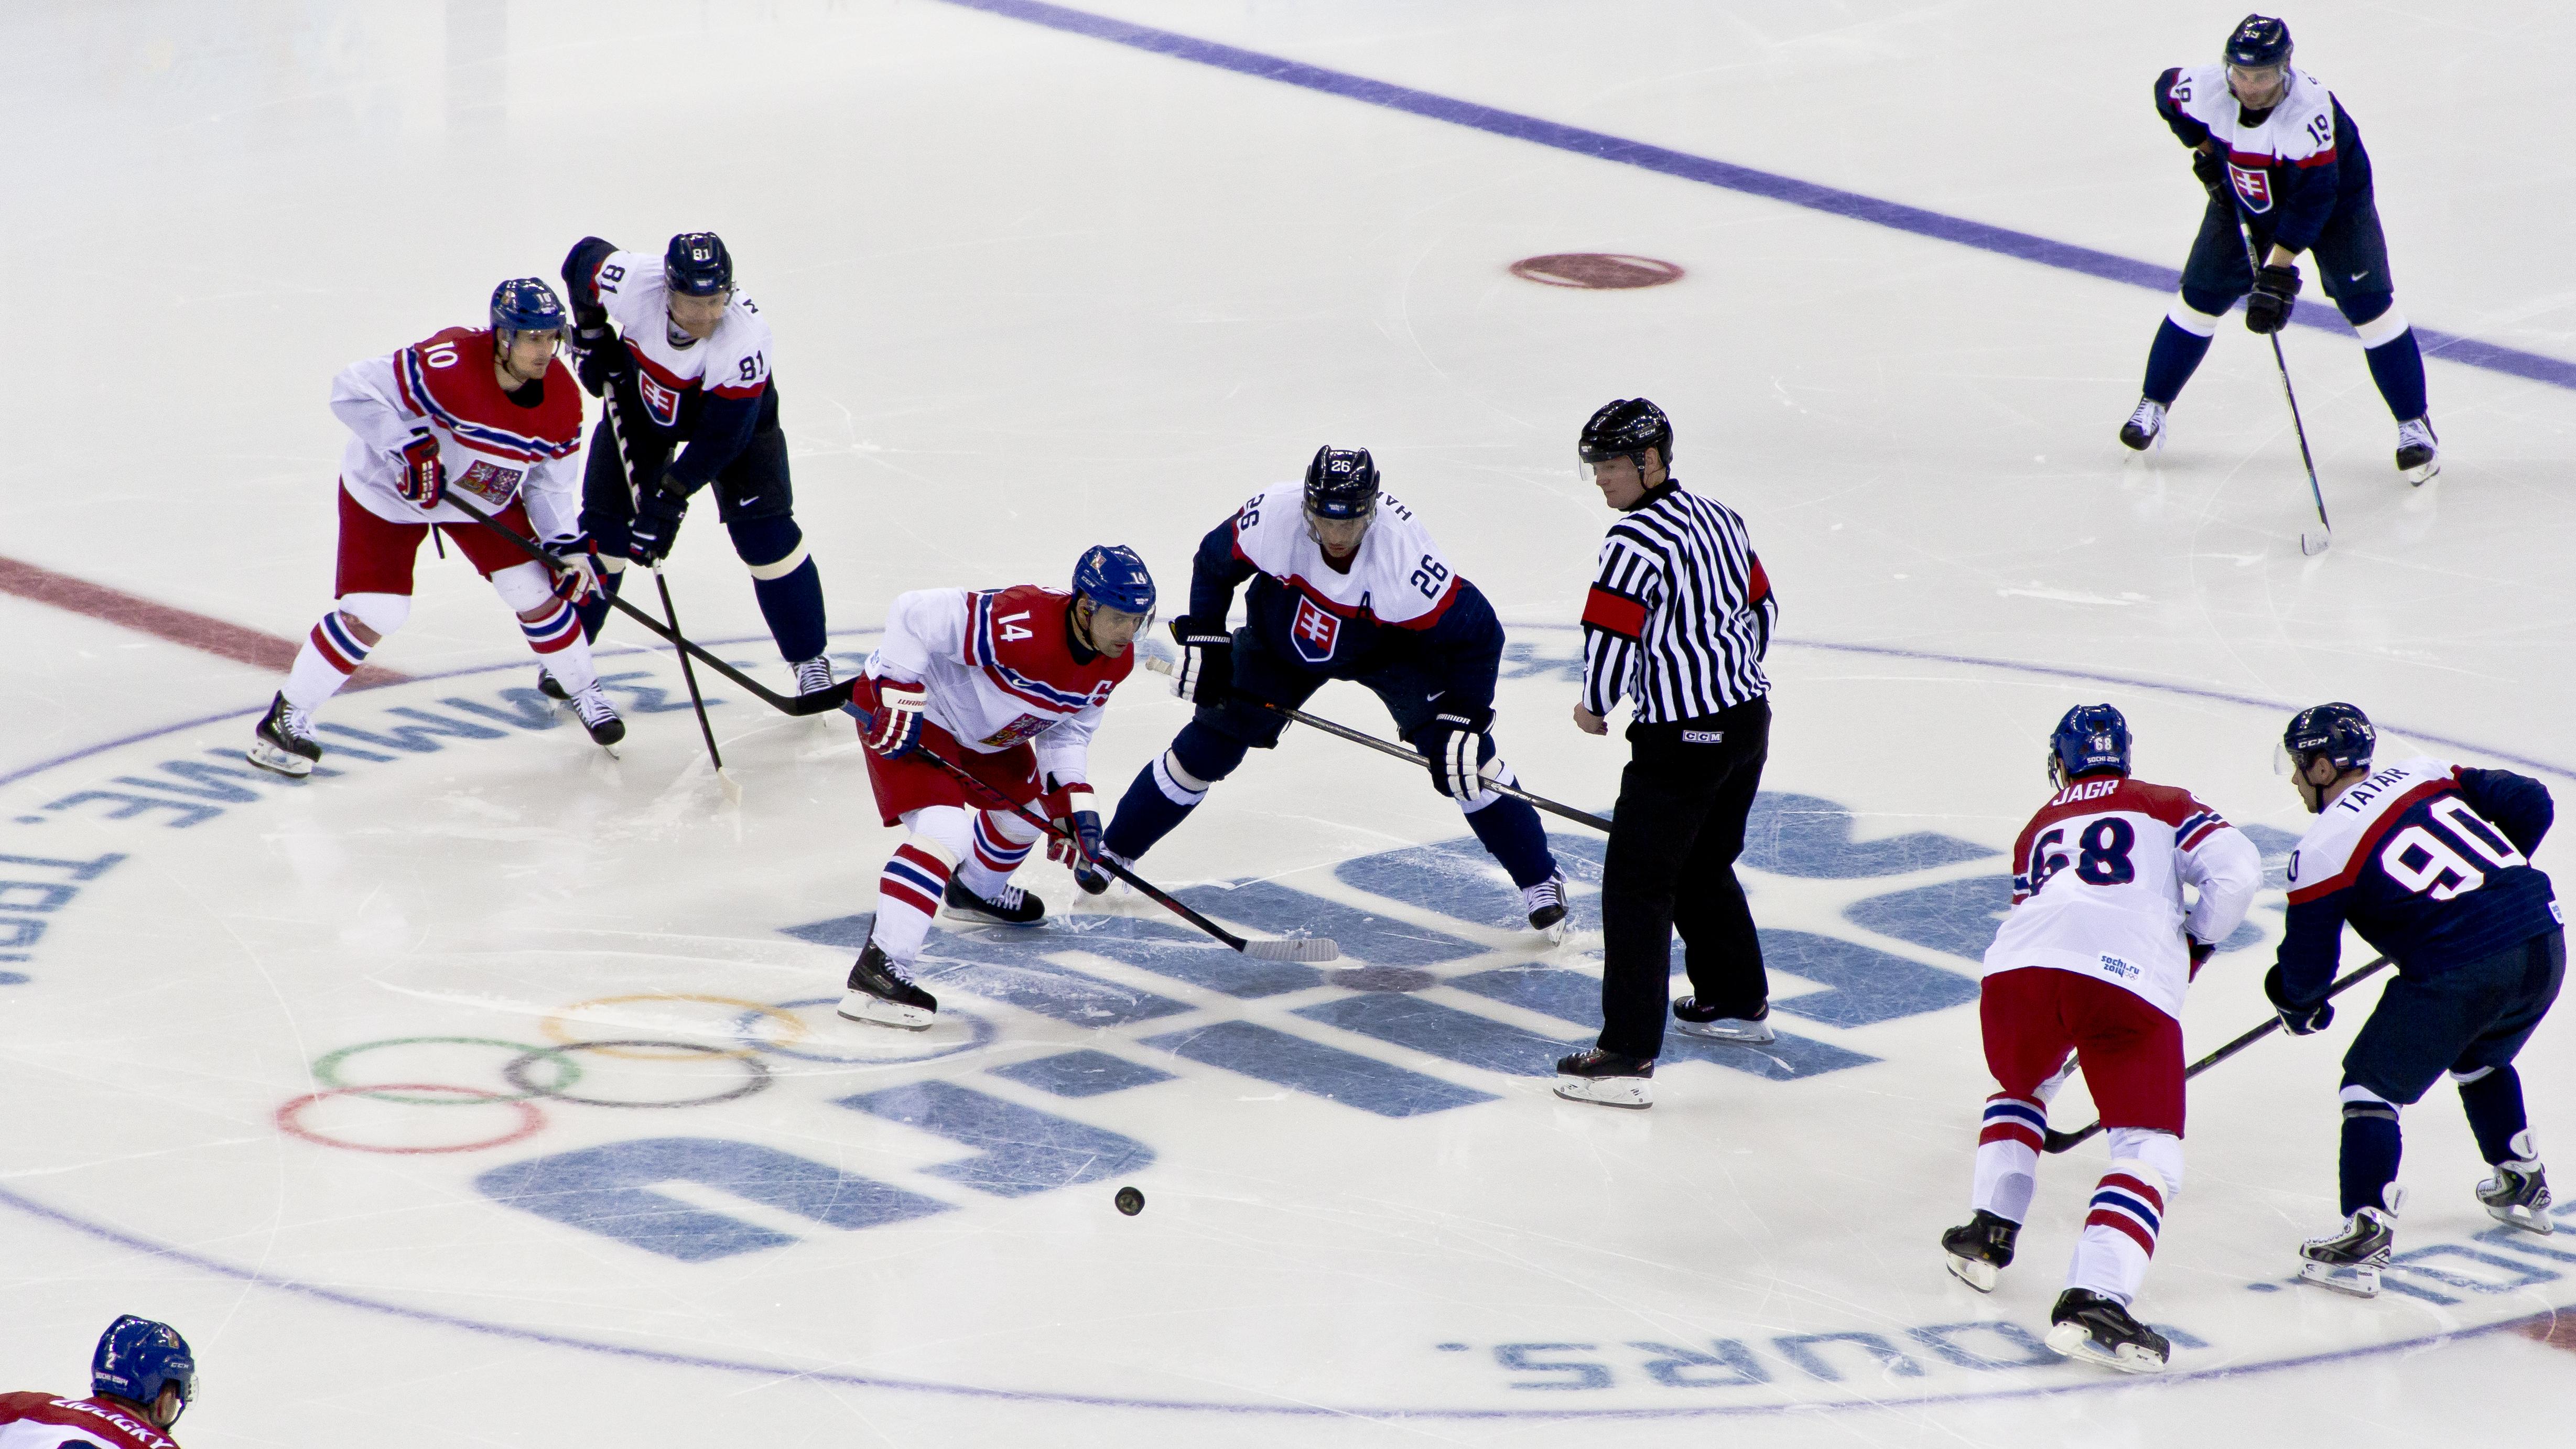 Adult hockey ice tournament